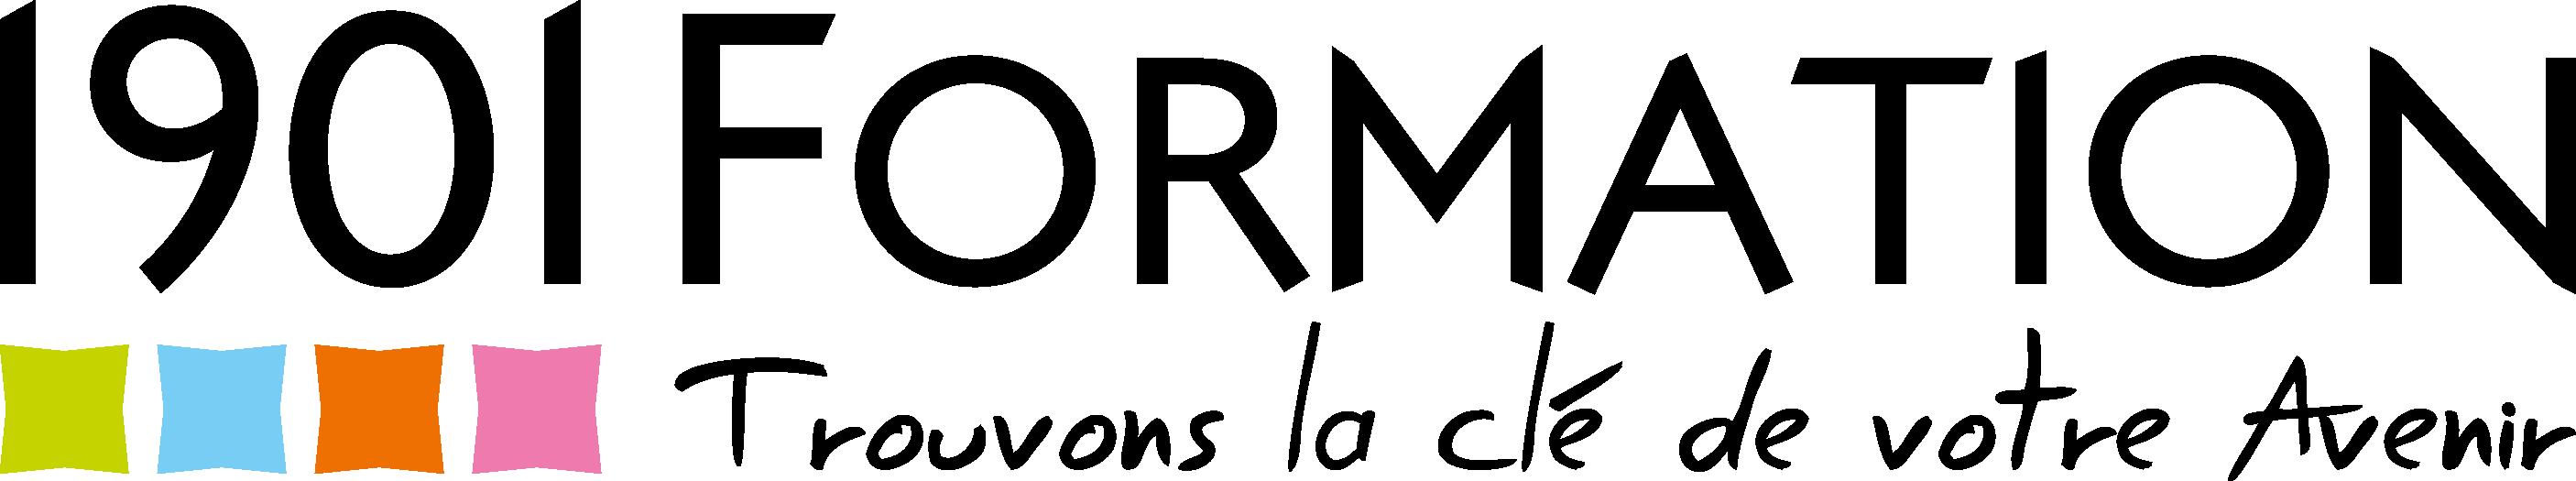 logo 1901 formation